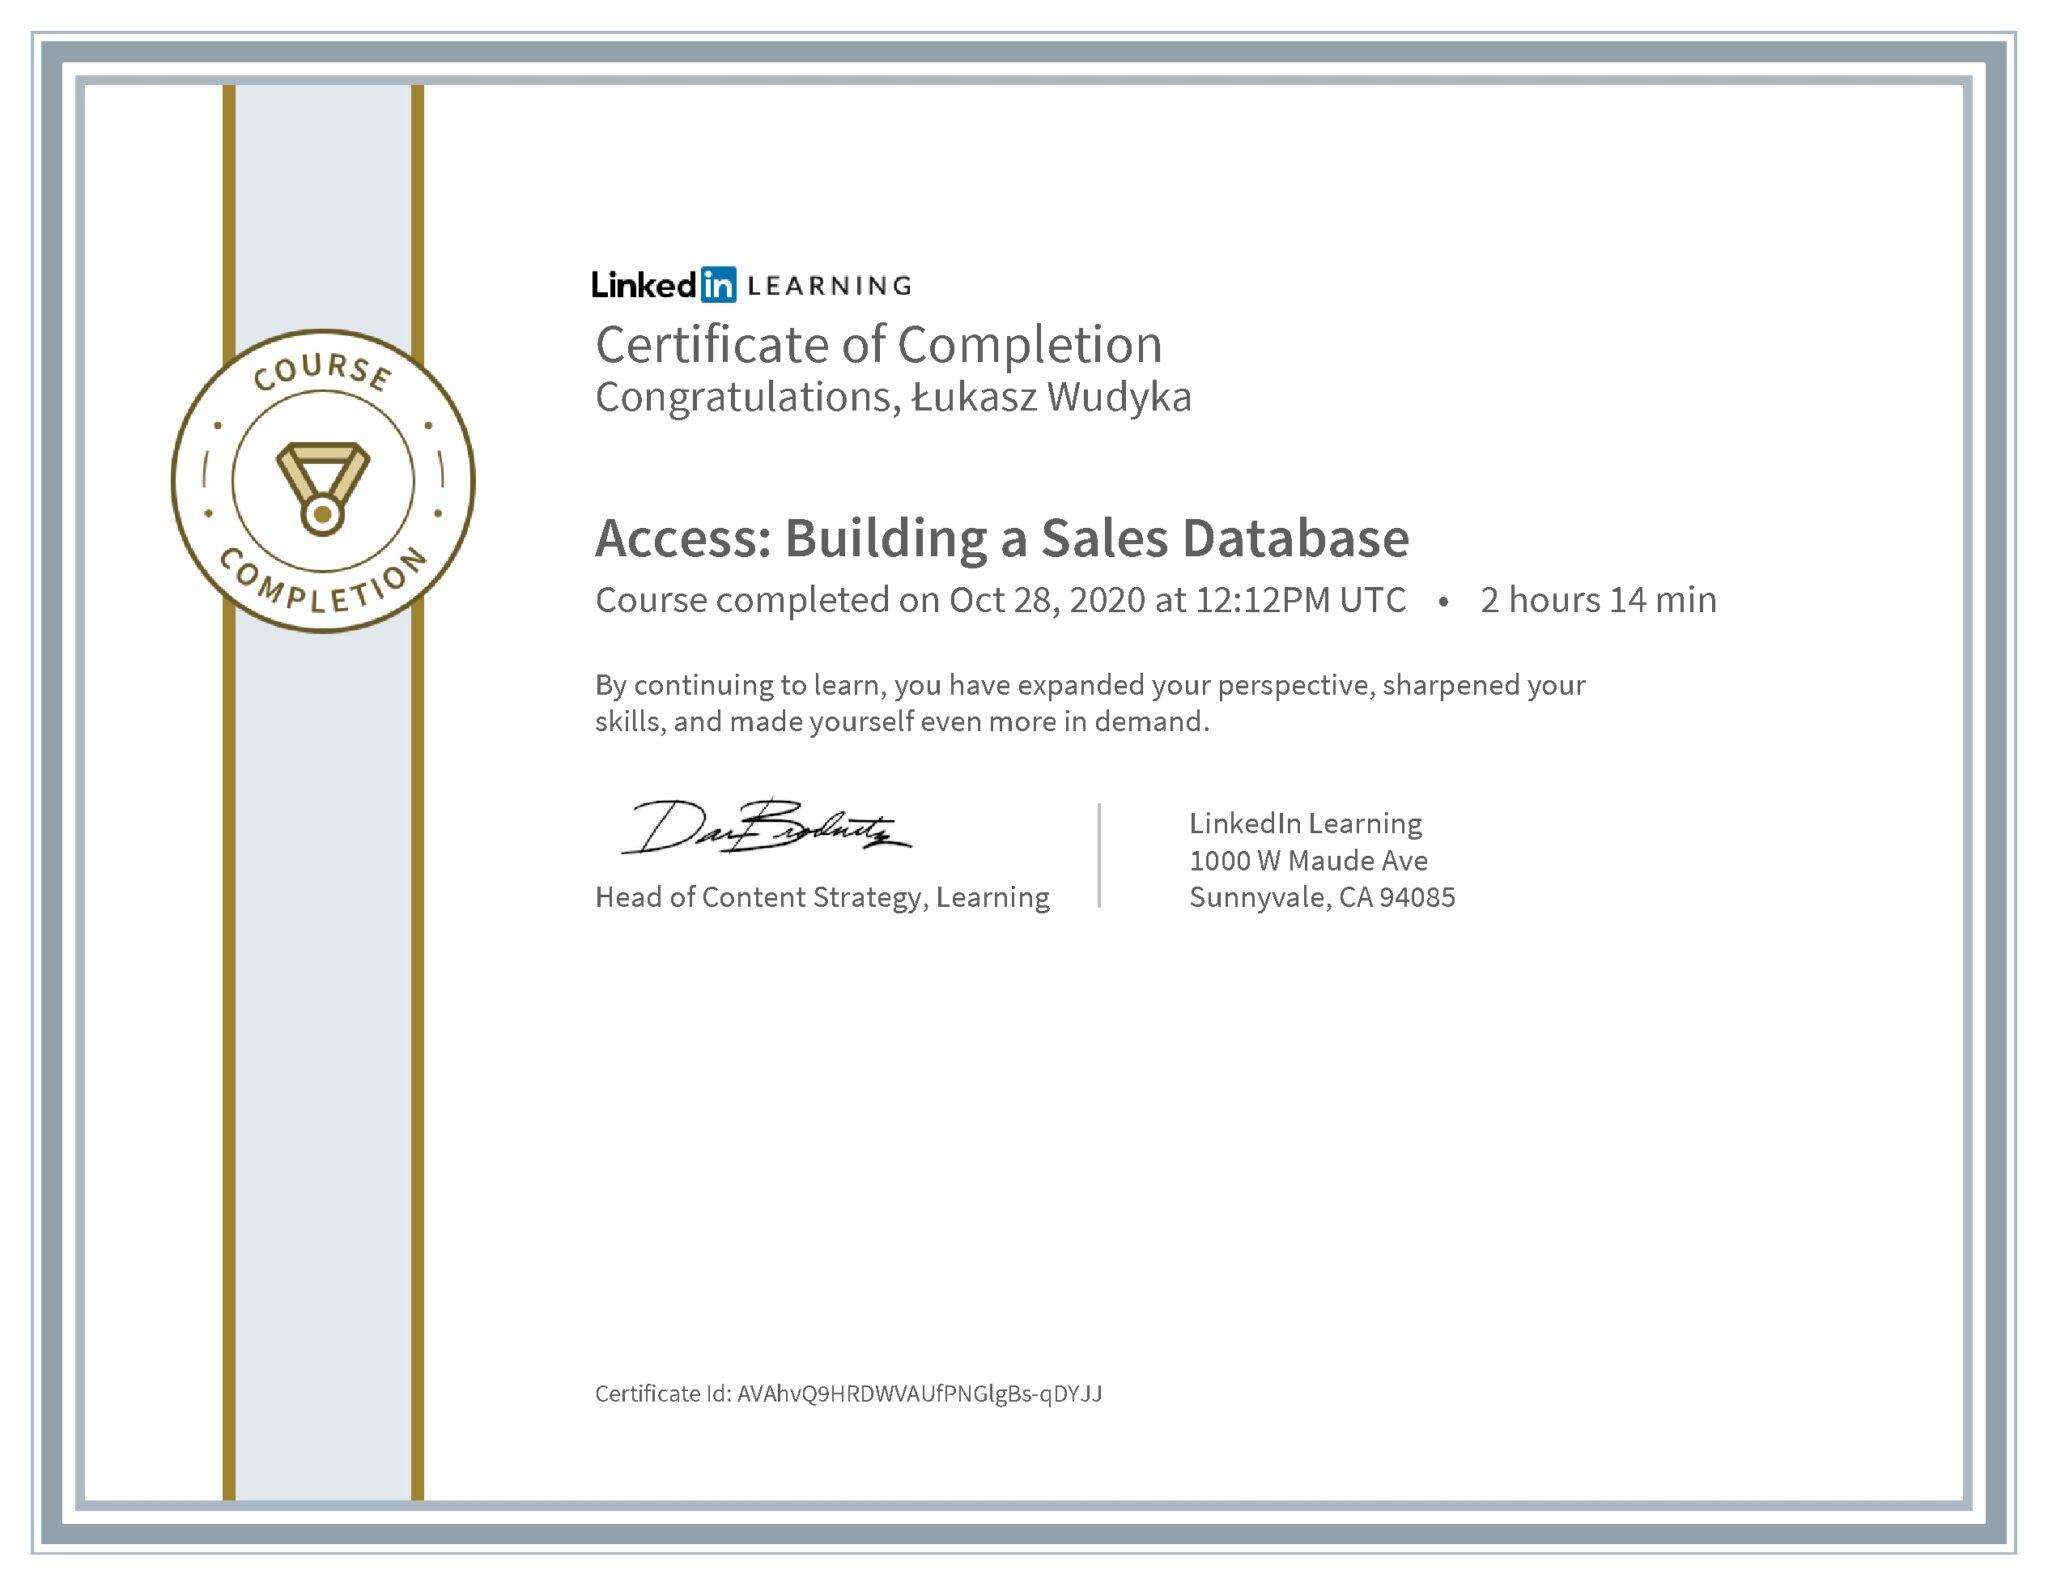 Łukasz Wudyka certyfikat LinkedIn Access: Building a Sales Database